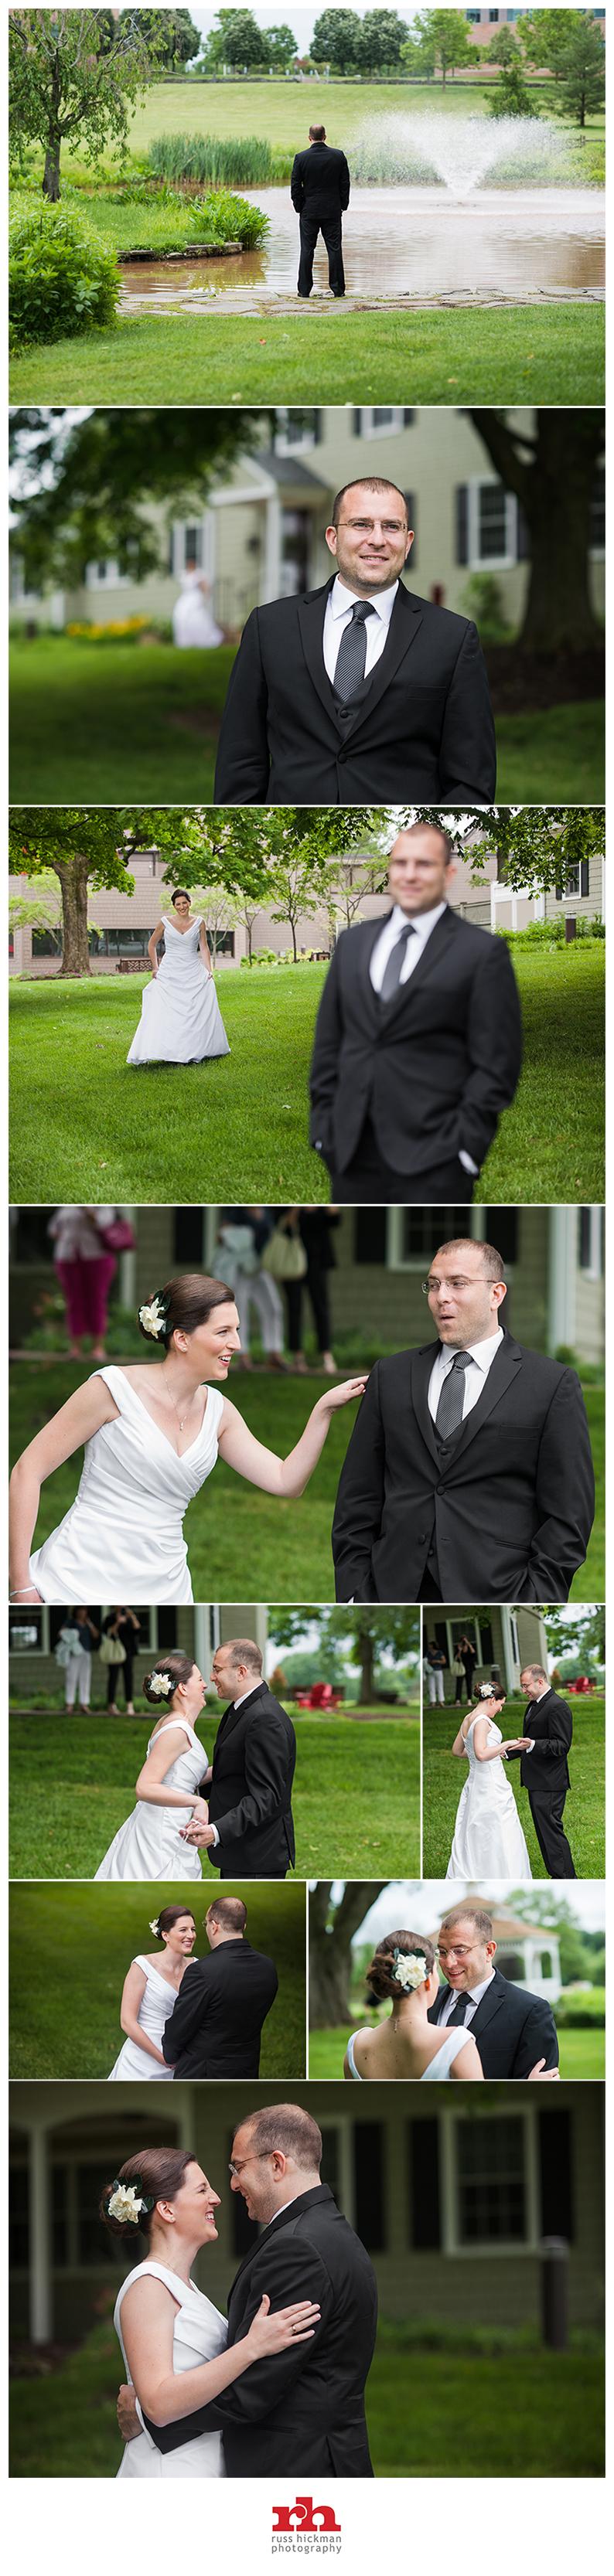 Philadelphia Wedding Photographer MZWB0002